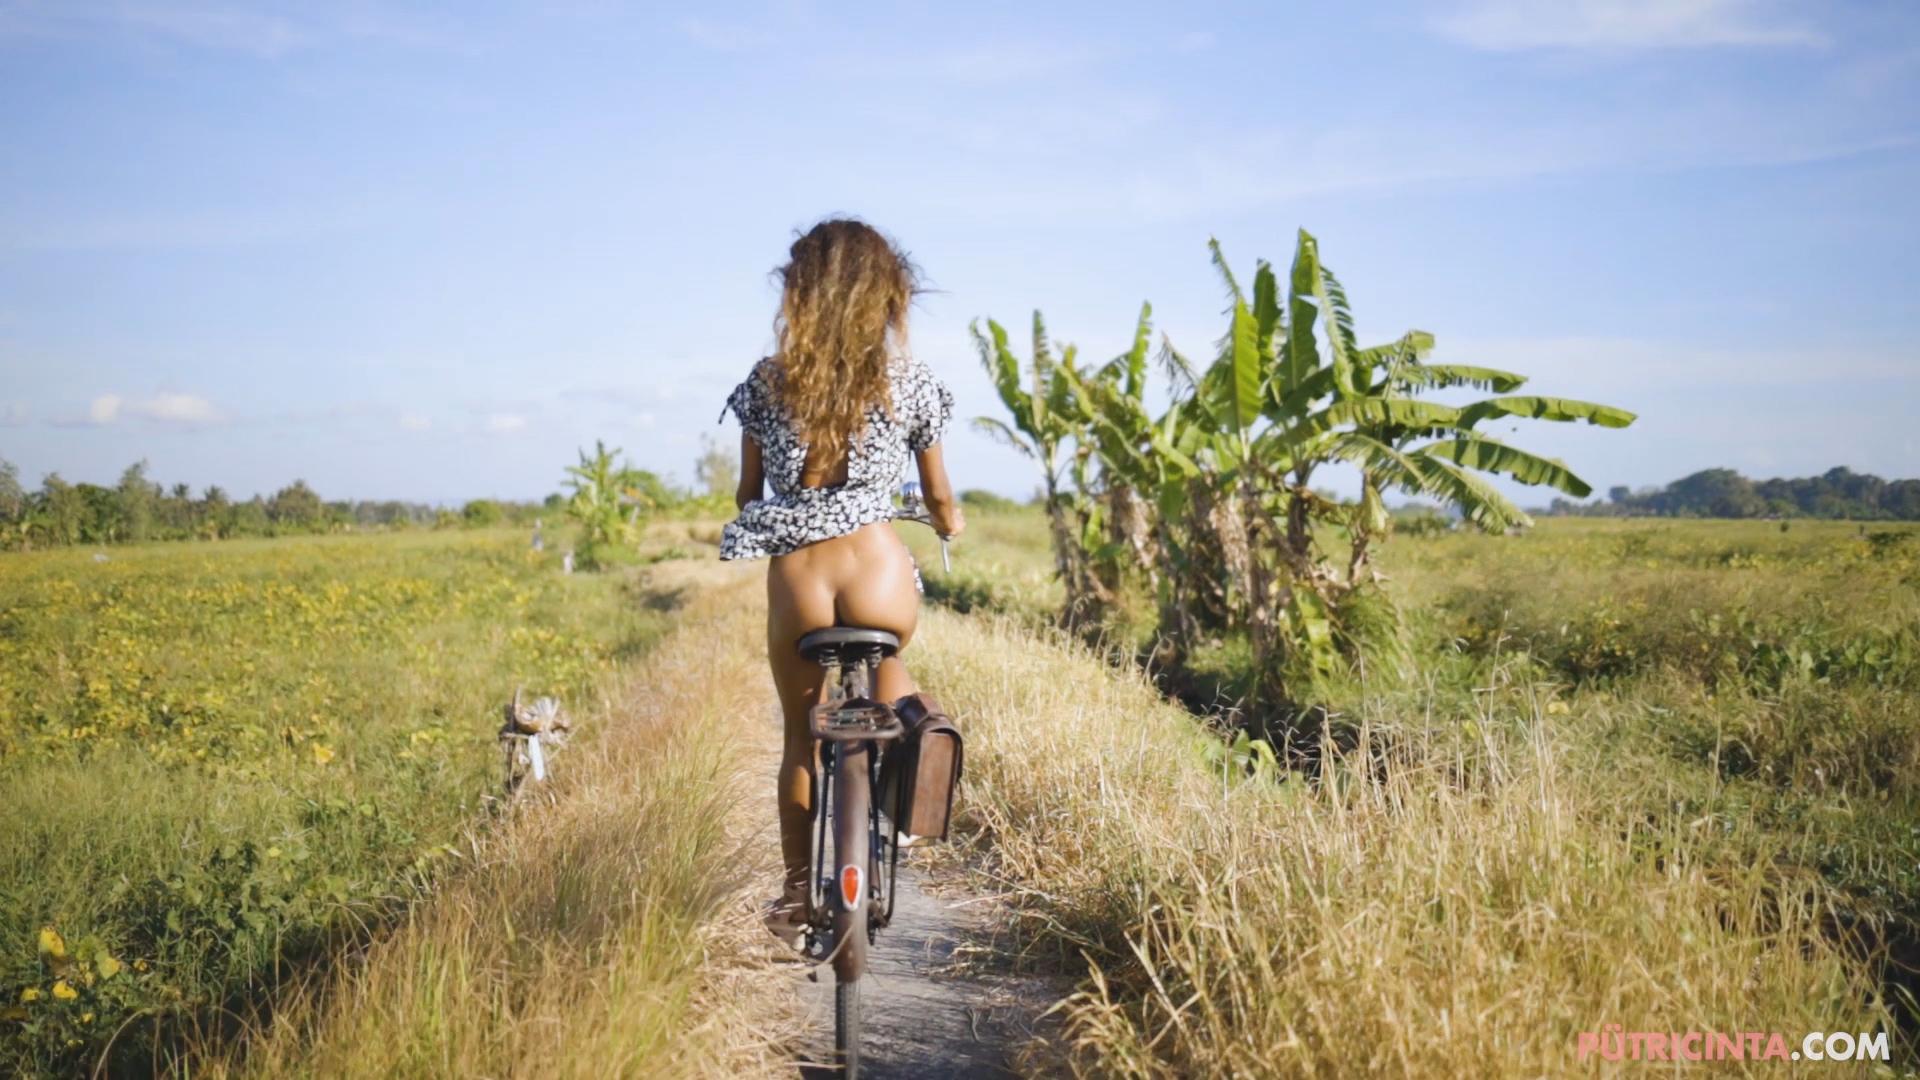 024-cyclingcommando-Putri-Cinta-teaser-stills-7.jpg